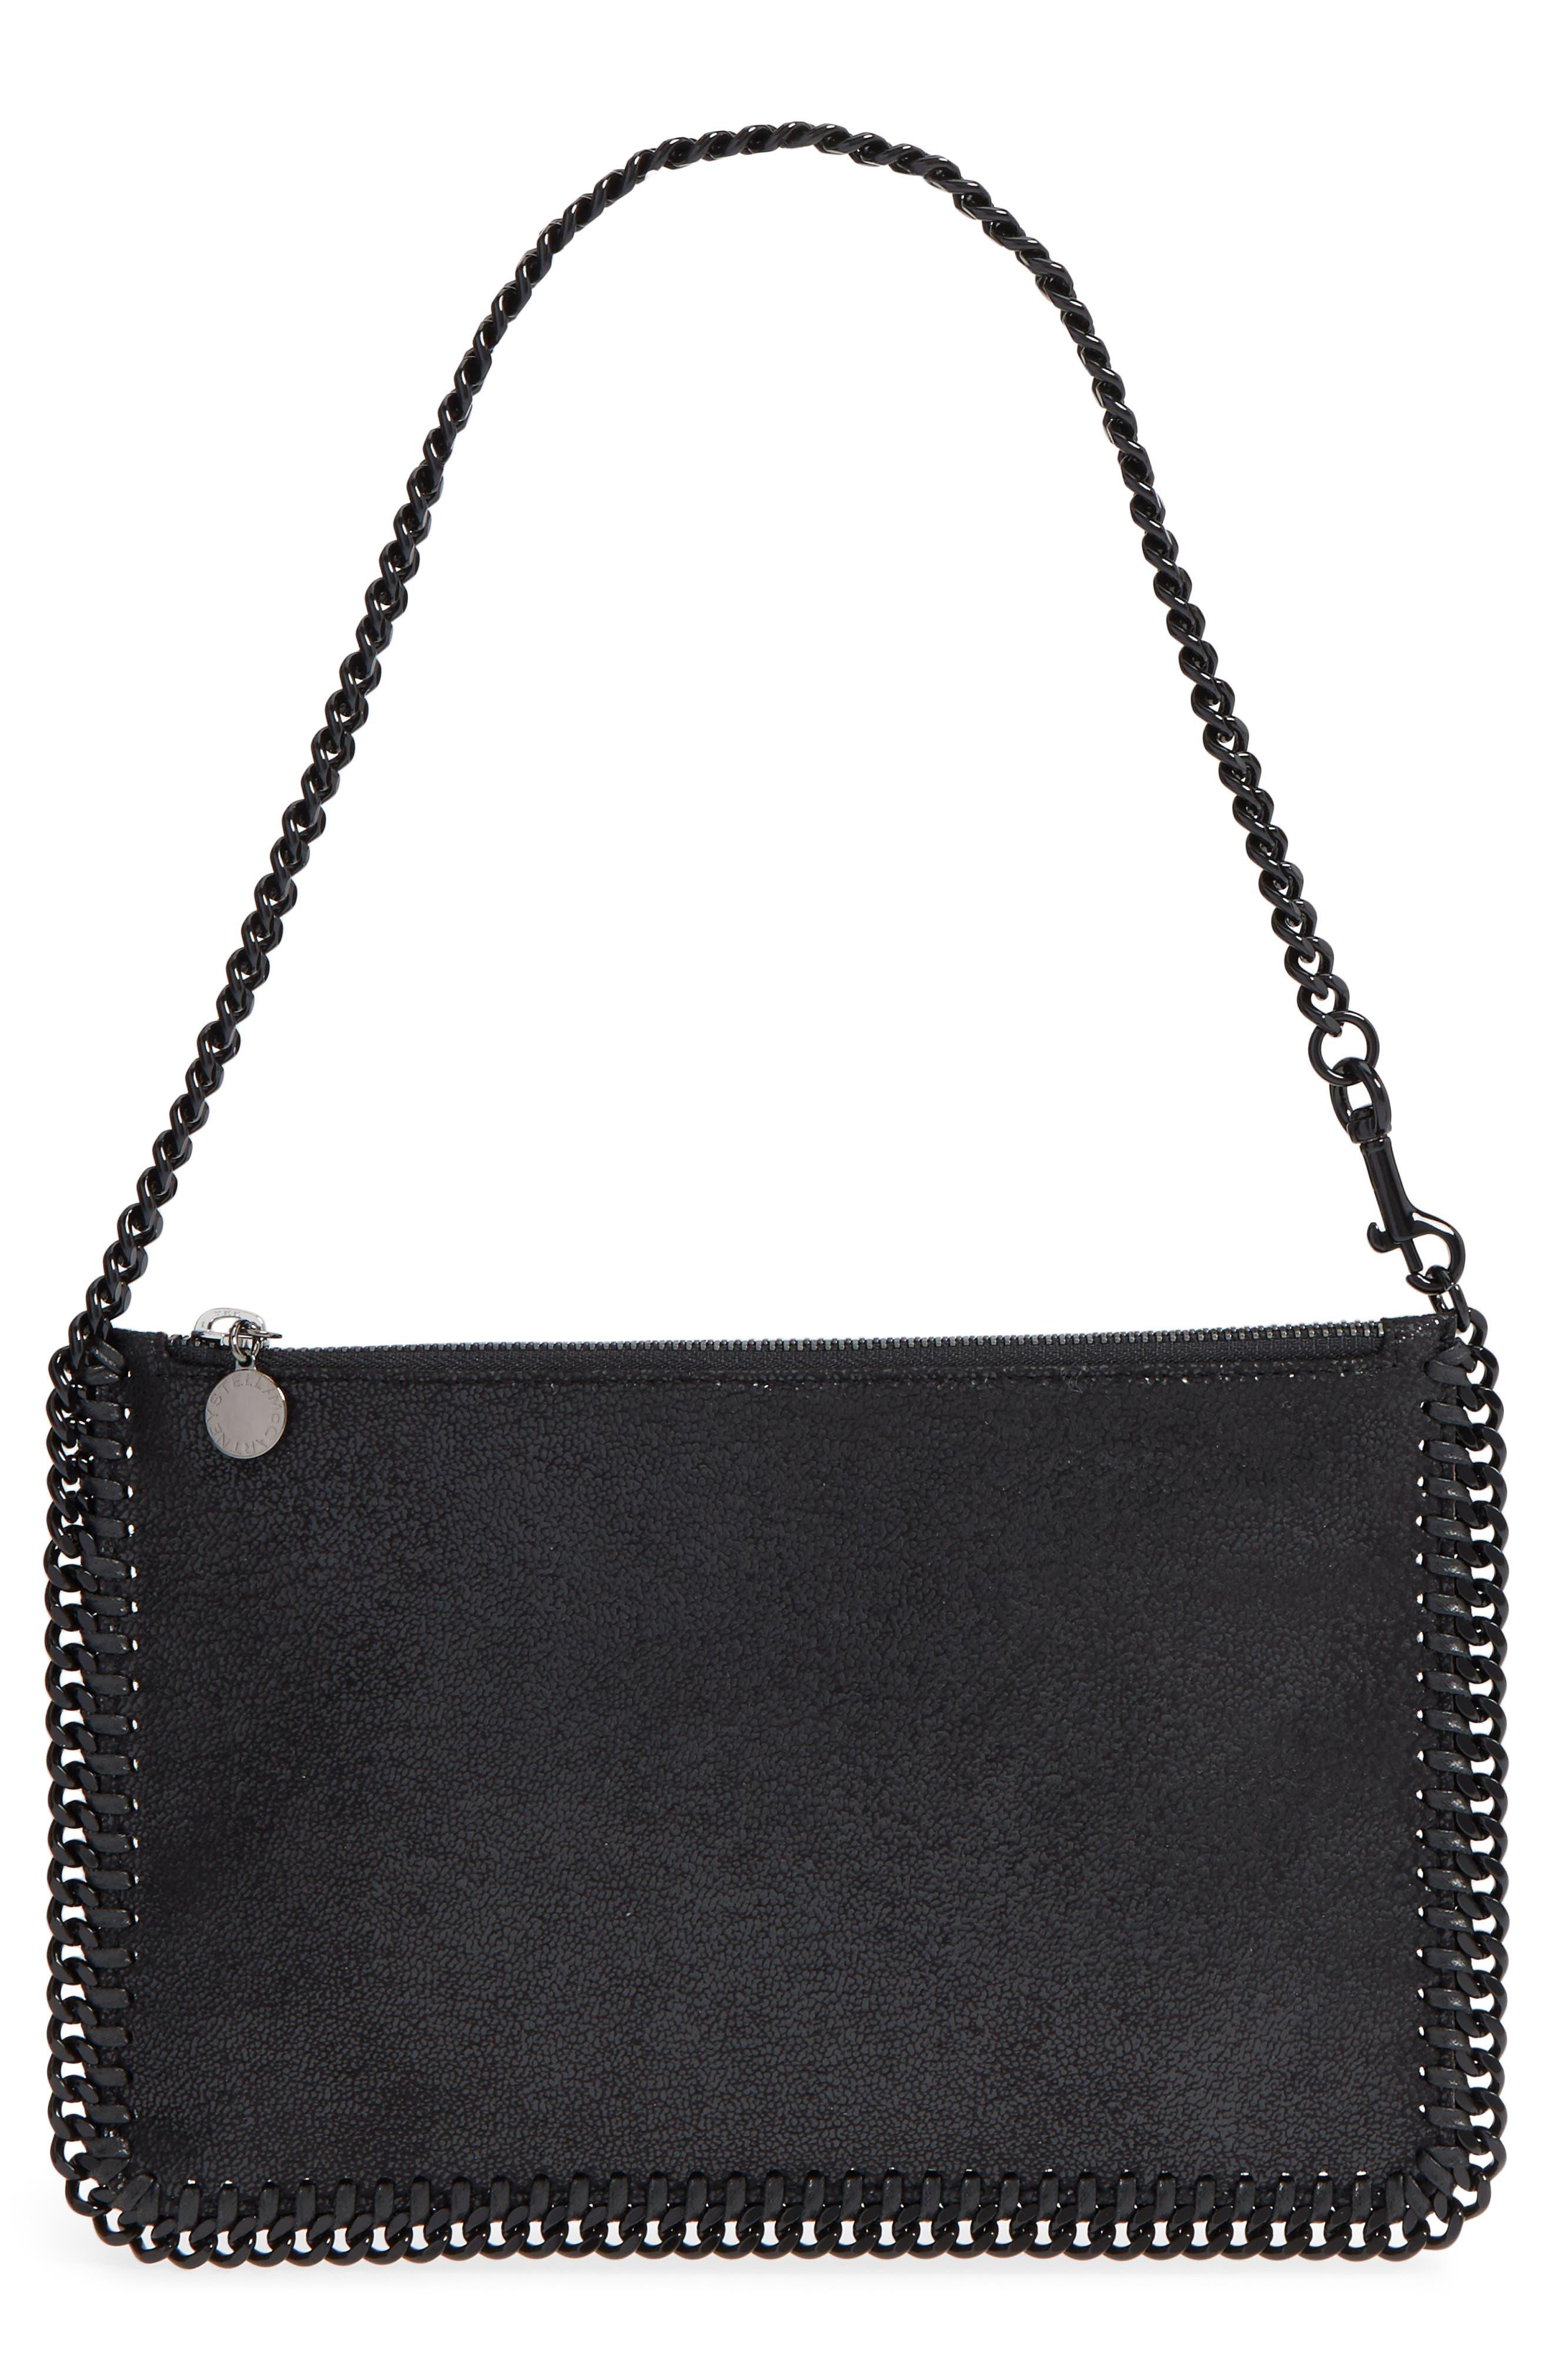 STELLA MCCARTNEY Falabella Shaggy Deer Faux Leather Handbag, Main, color, 001